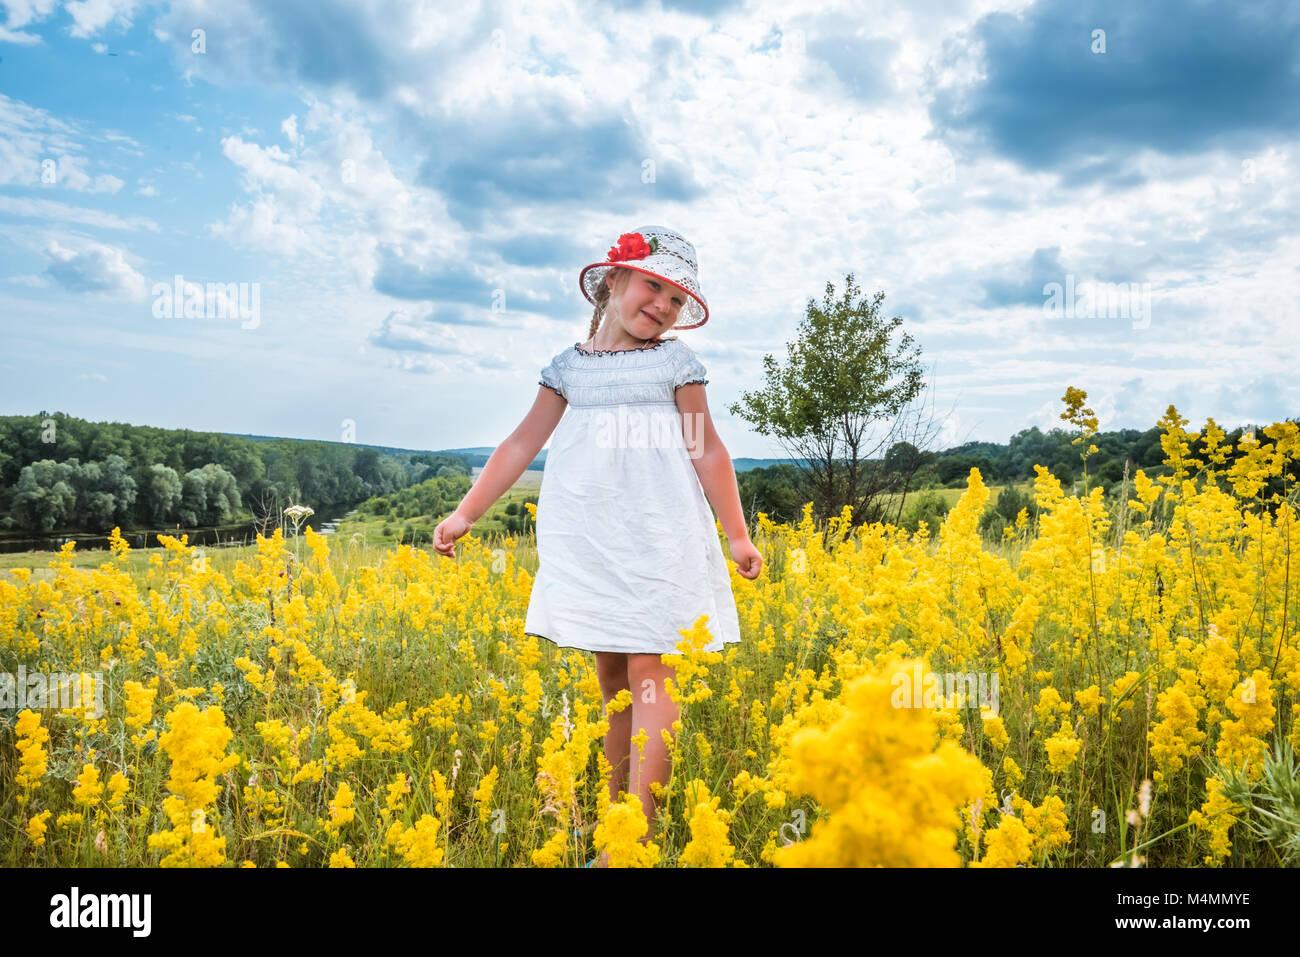 Cute Little Laughing Girl Walking In Field Of Yellow Flowers Stock